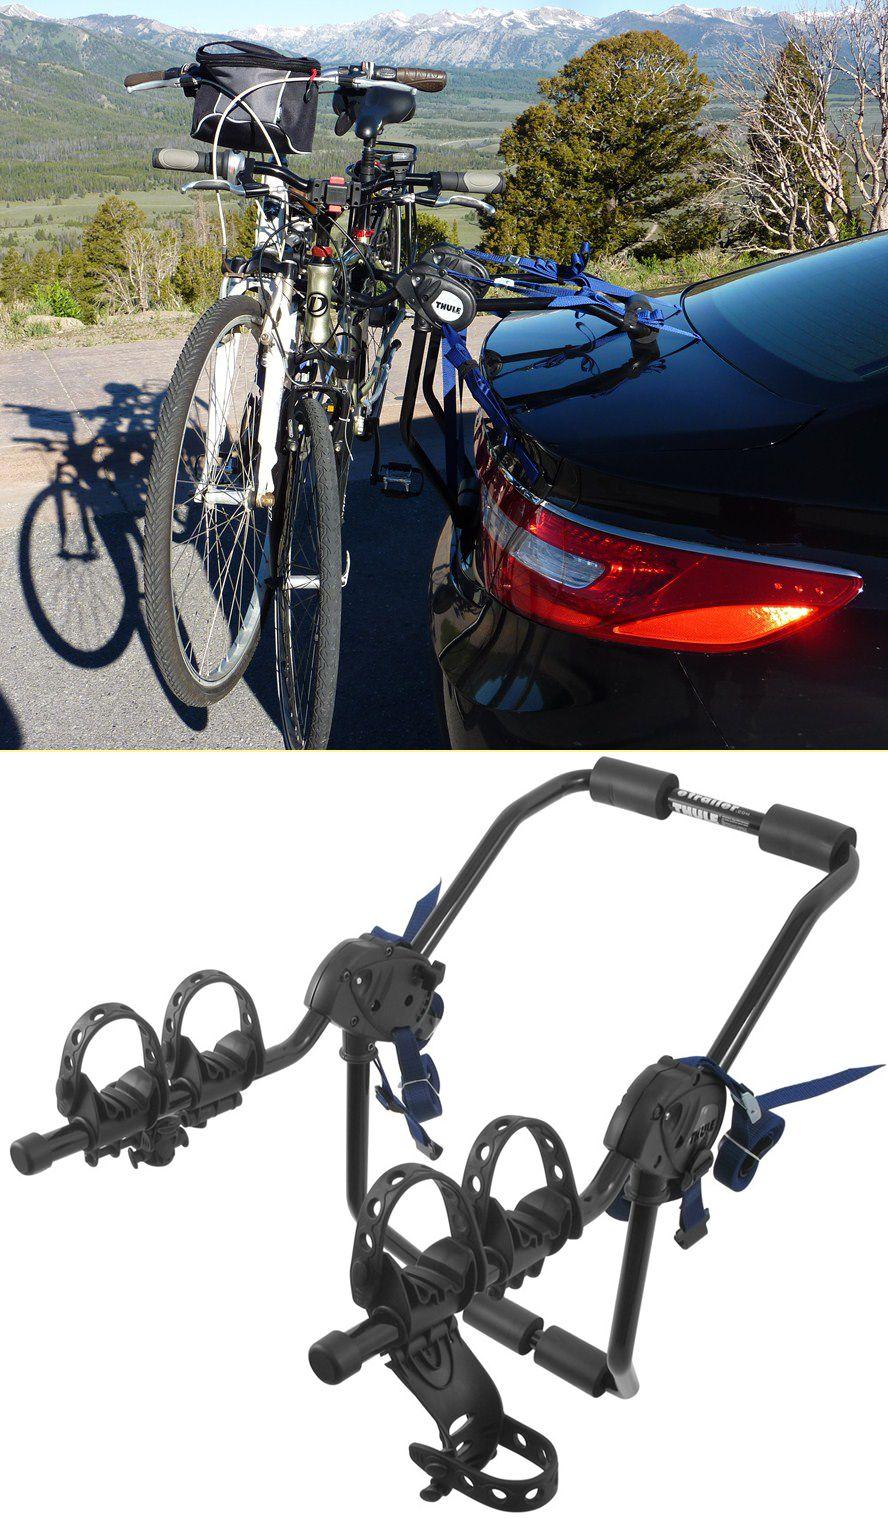 clothes hitch mount review nv black bike bikes aerogeeks gr beta spice rack dsc reviewed kuat sherpa